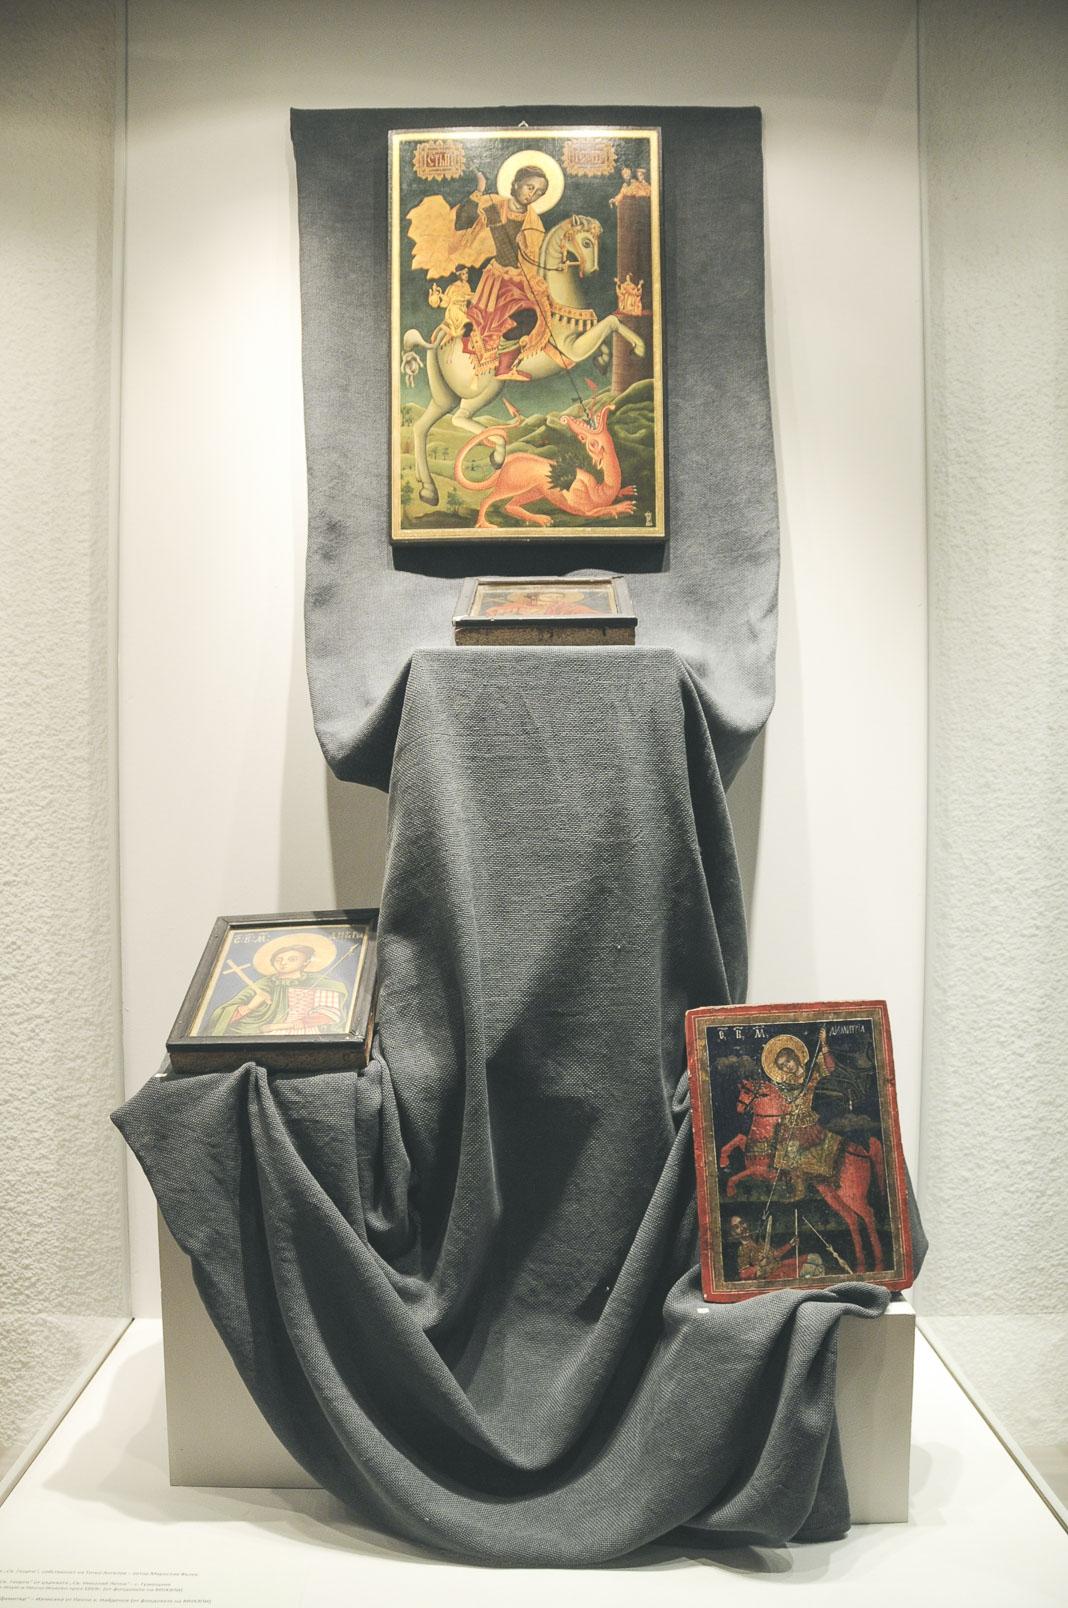 troyan-museum-jivotat-na-edna-idea-9